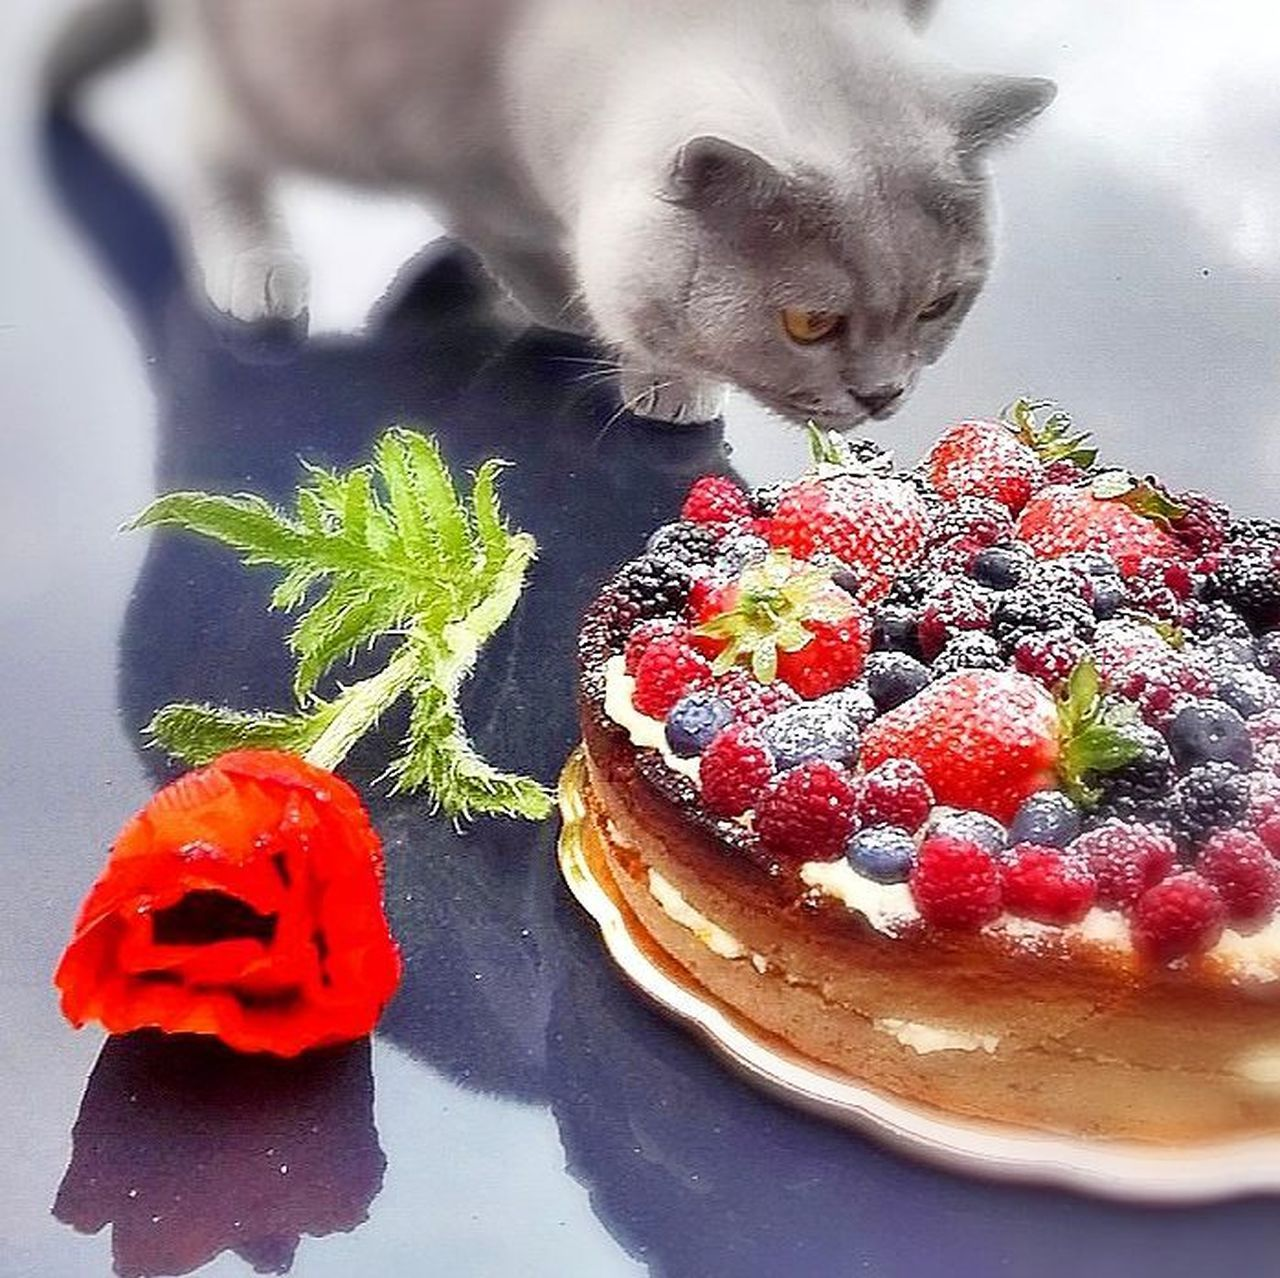 Cake Cake♥ Cat Flower Fruits I´msmart Kocour My Love Myhome Můj Kocourek Nomnom Photo With A Story Photo With Smartphone Terrasse Venoušek